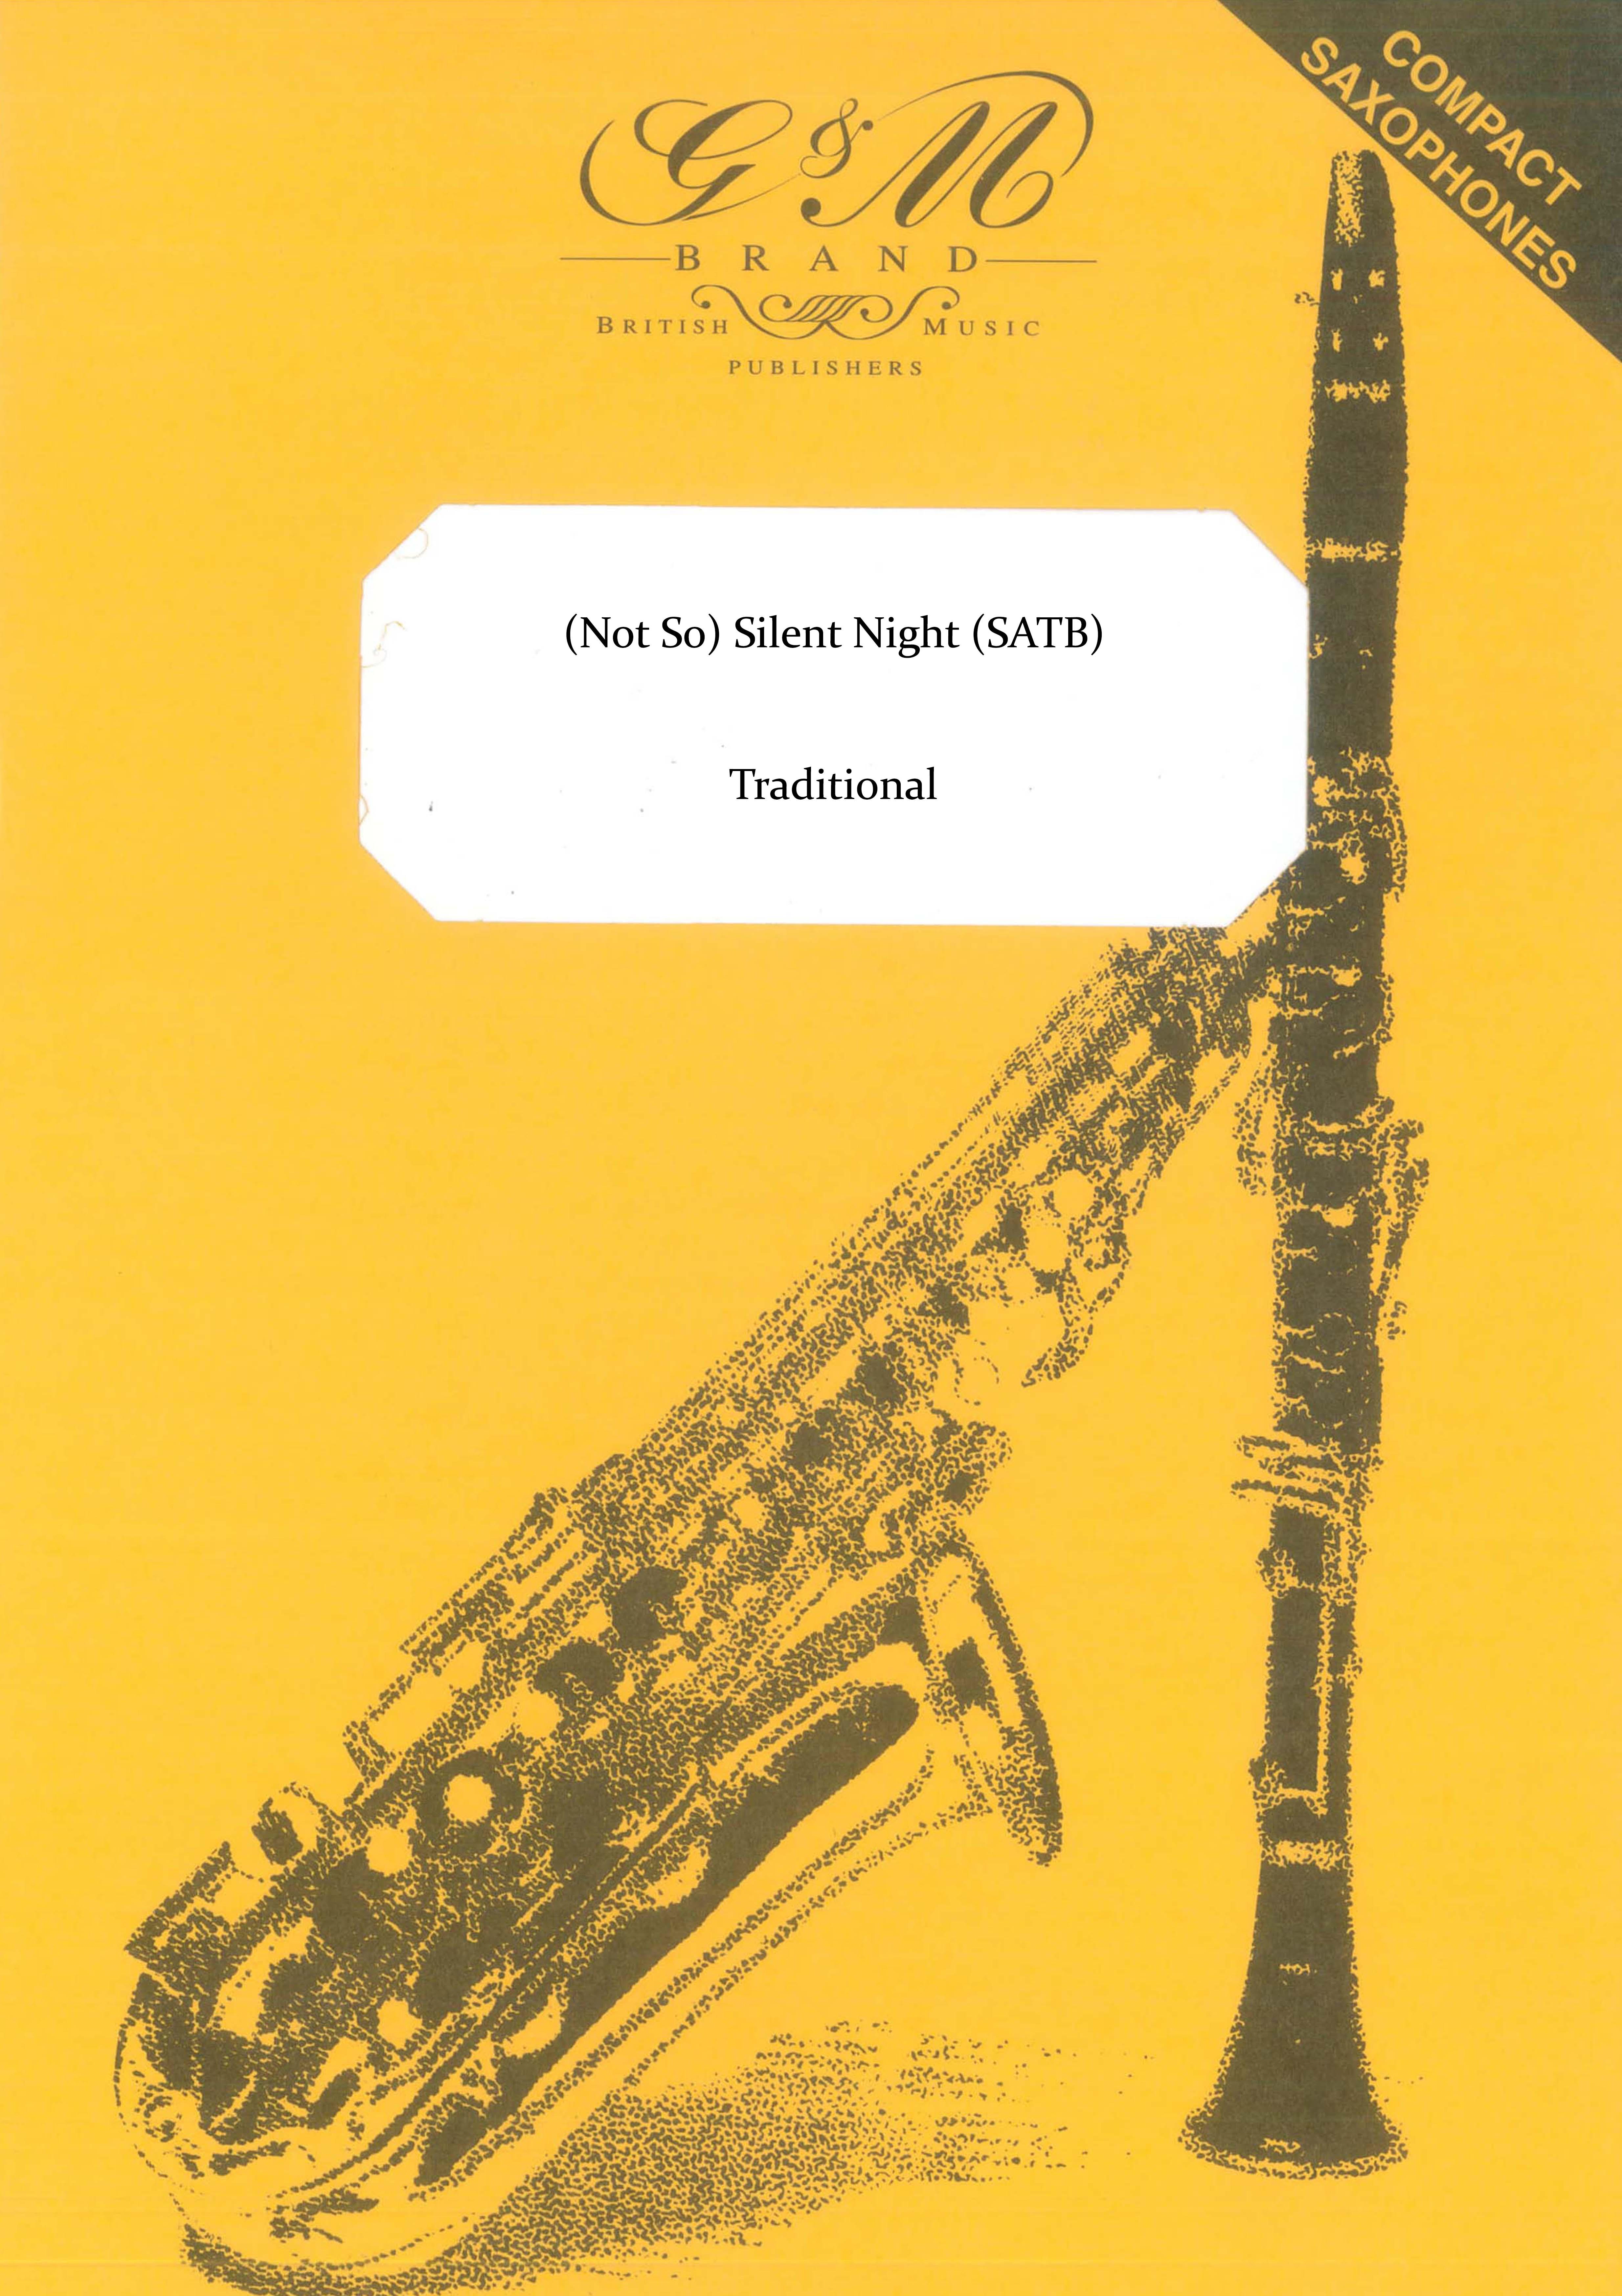 (Not So) Silent Night (Saxophone Quartet)